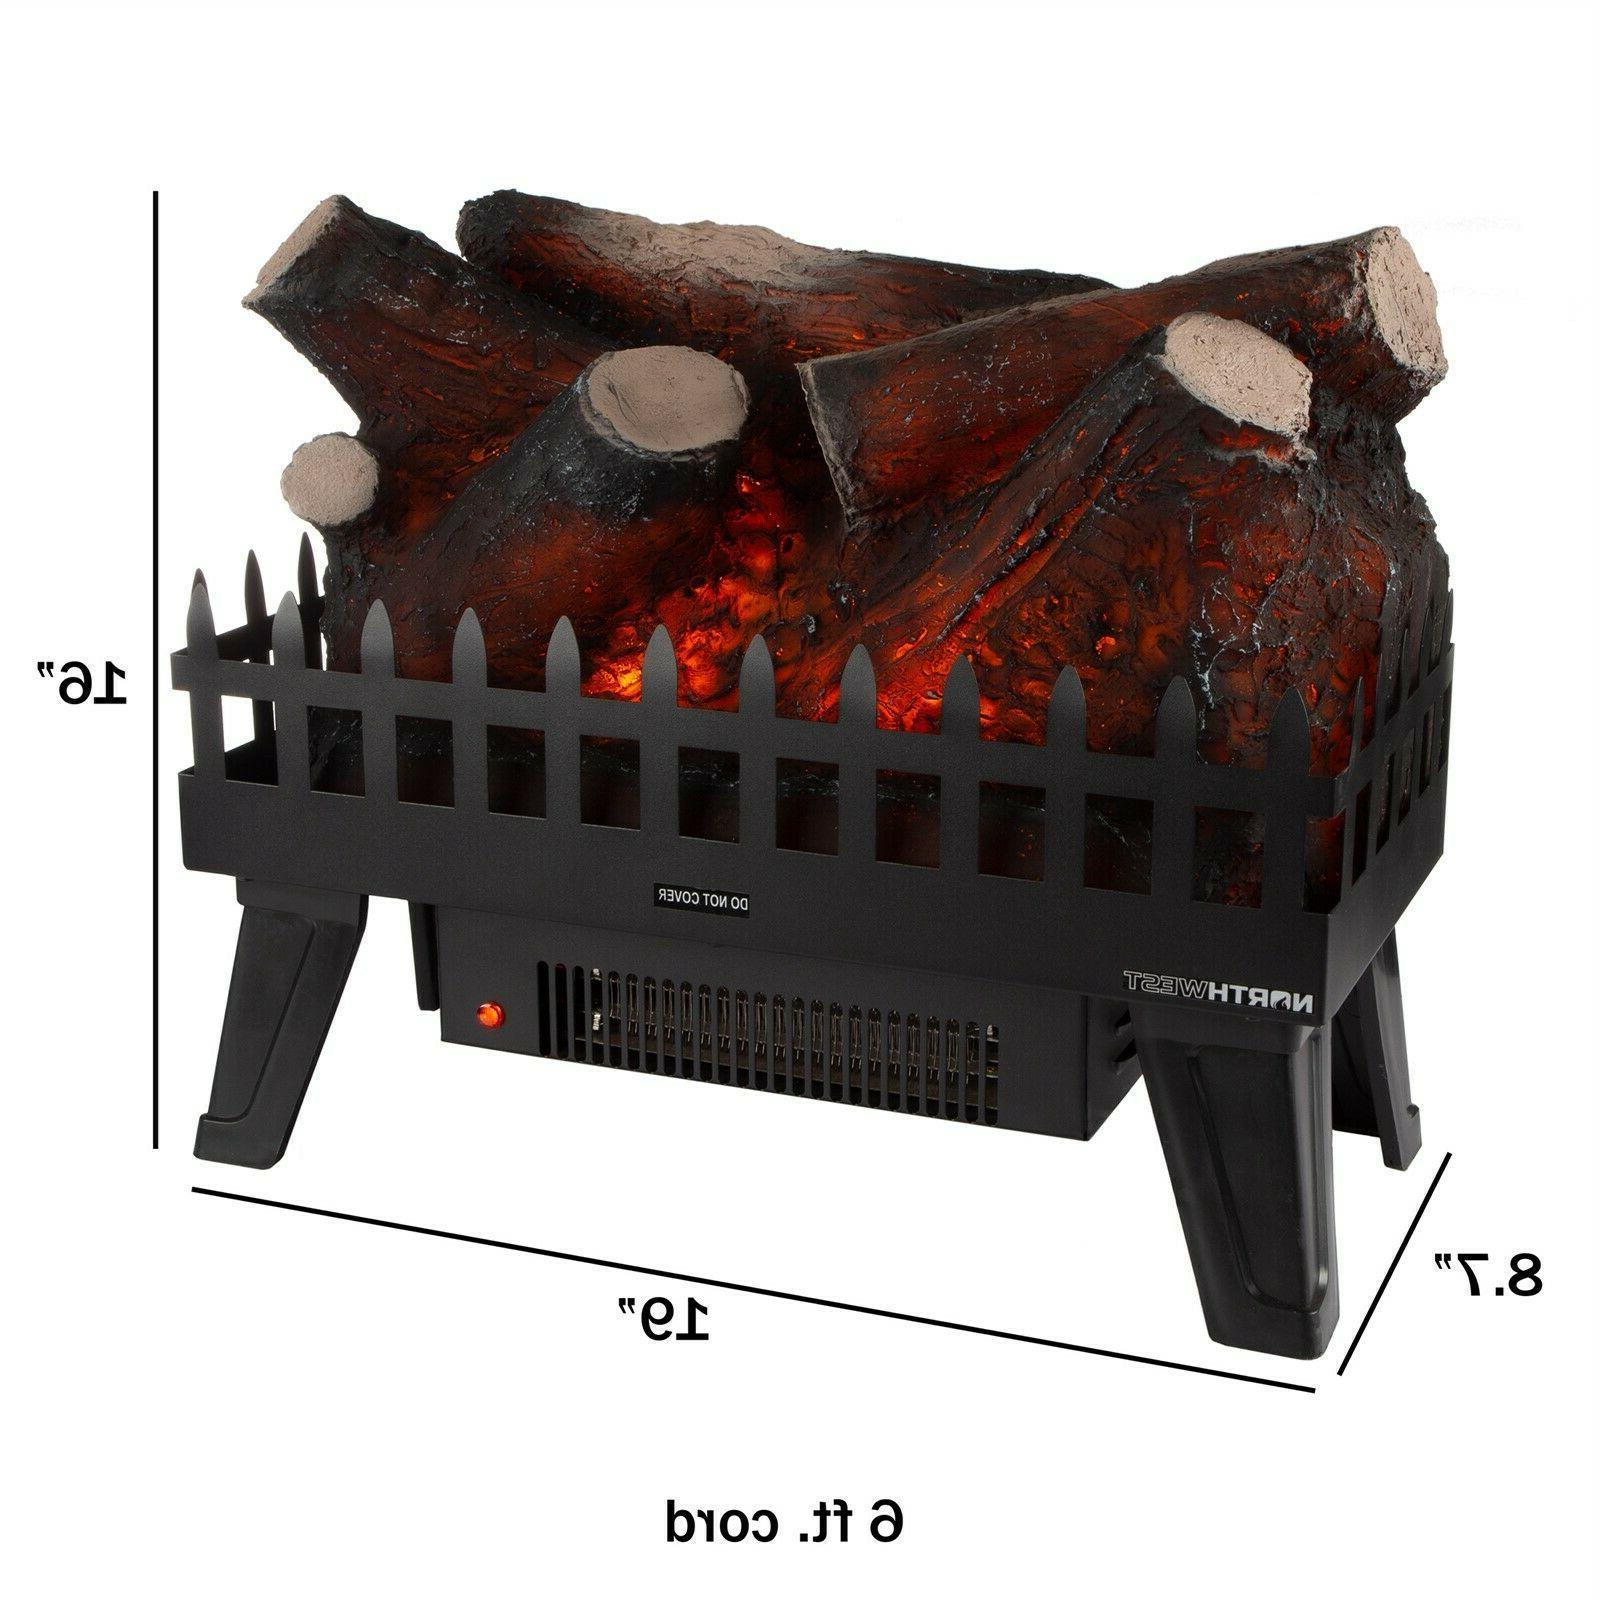 Electric Fake Insert Glowing Energy Heating